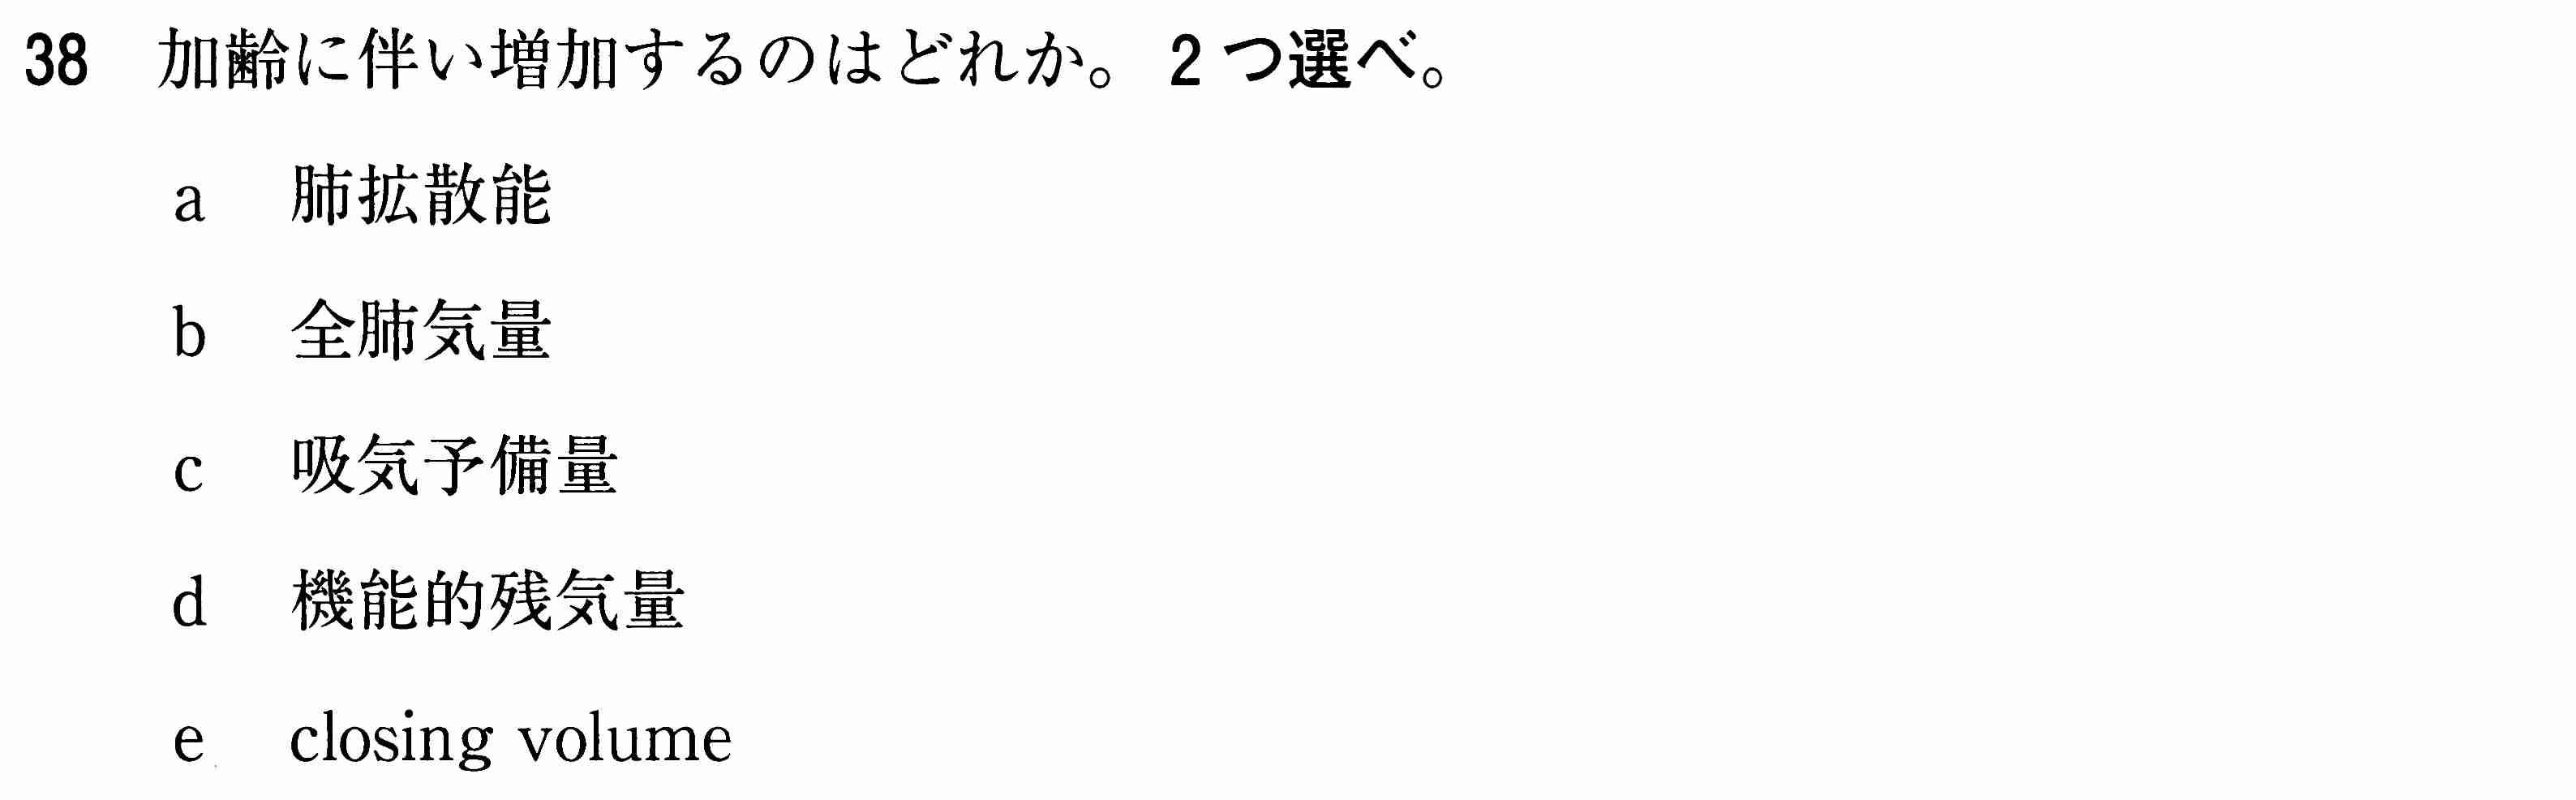 111G38.jpg